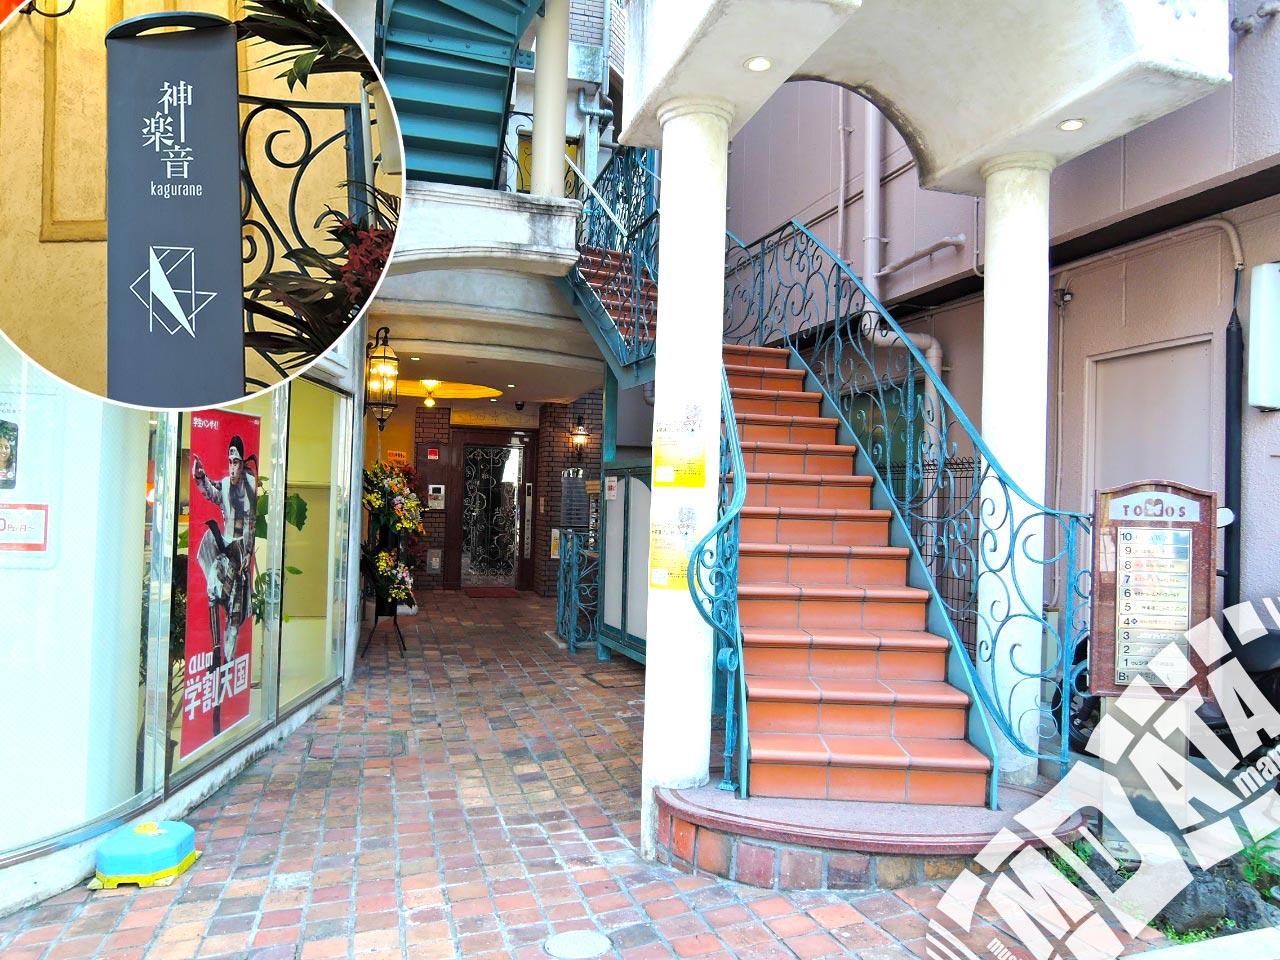 「KGR(N)(神楽音)」(新宿区-ライブハウス/クラブ- …